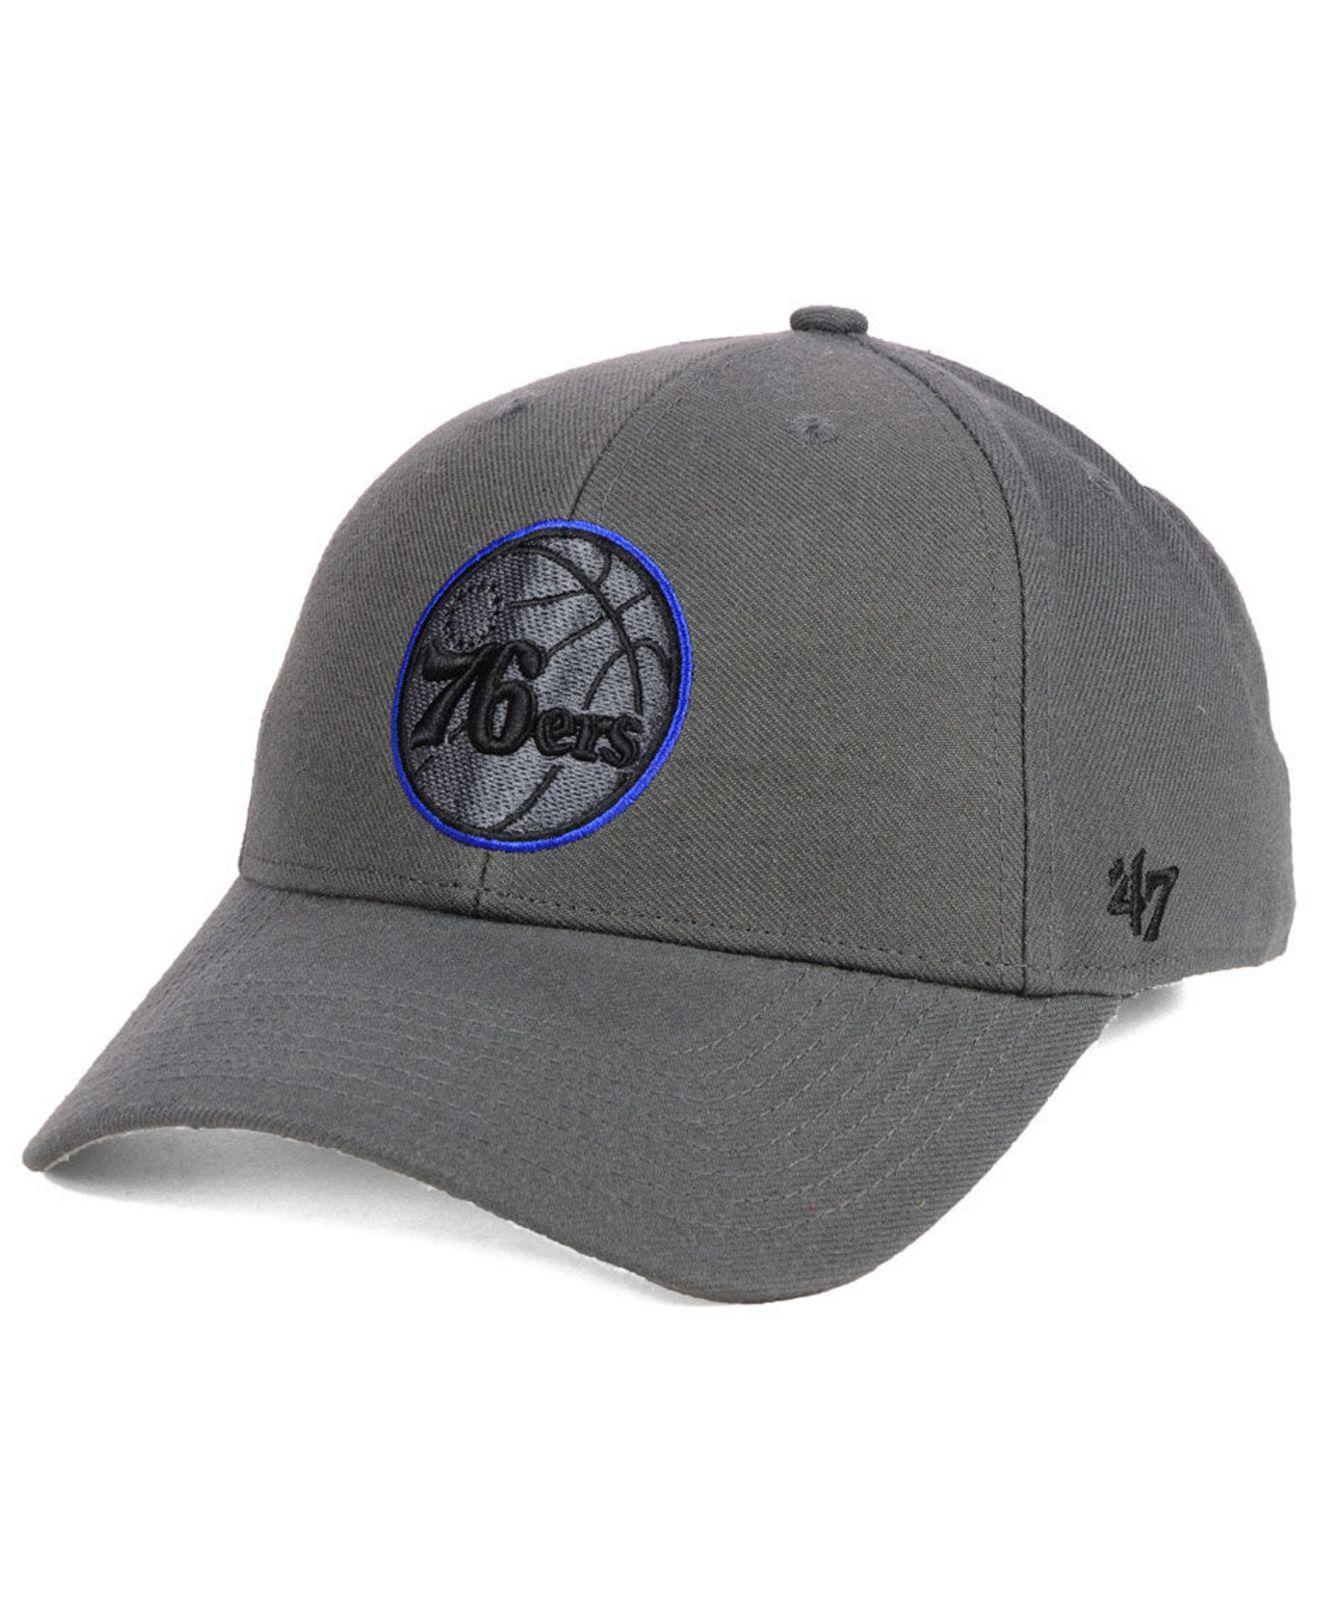 4946e9636a6aa Lyst - 47 Brand Philadelphia 76ers Charcoal Pop Mvp Cap in Gray for Men